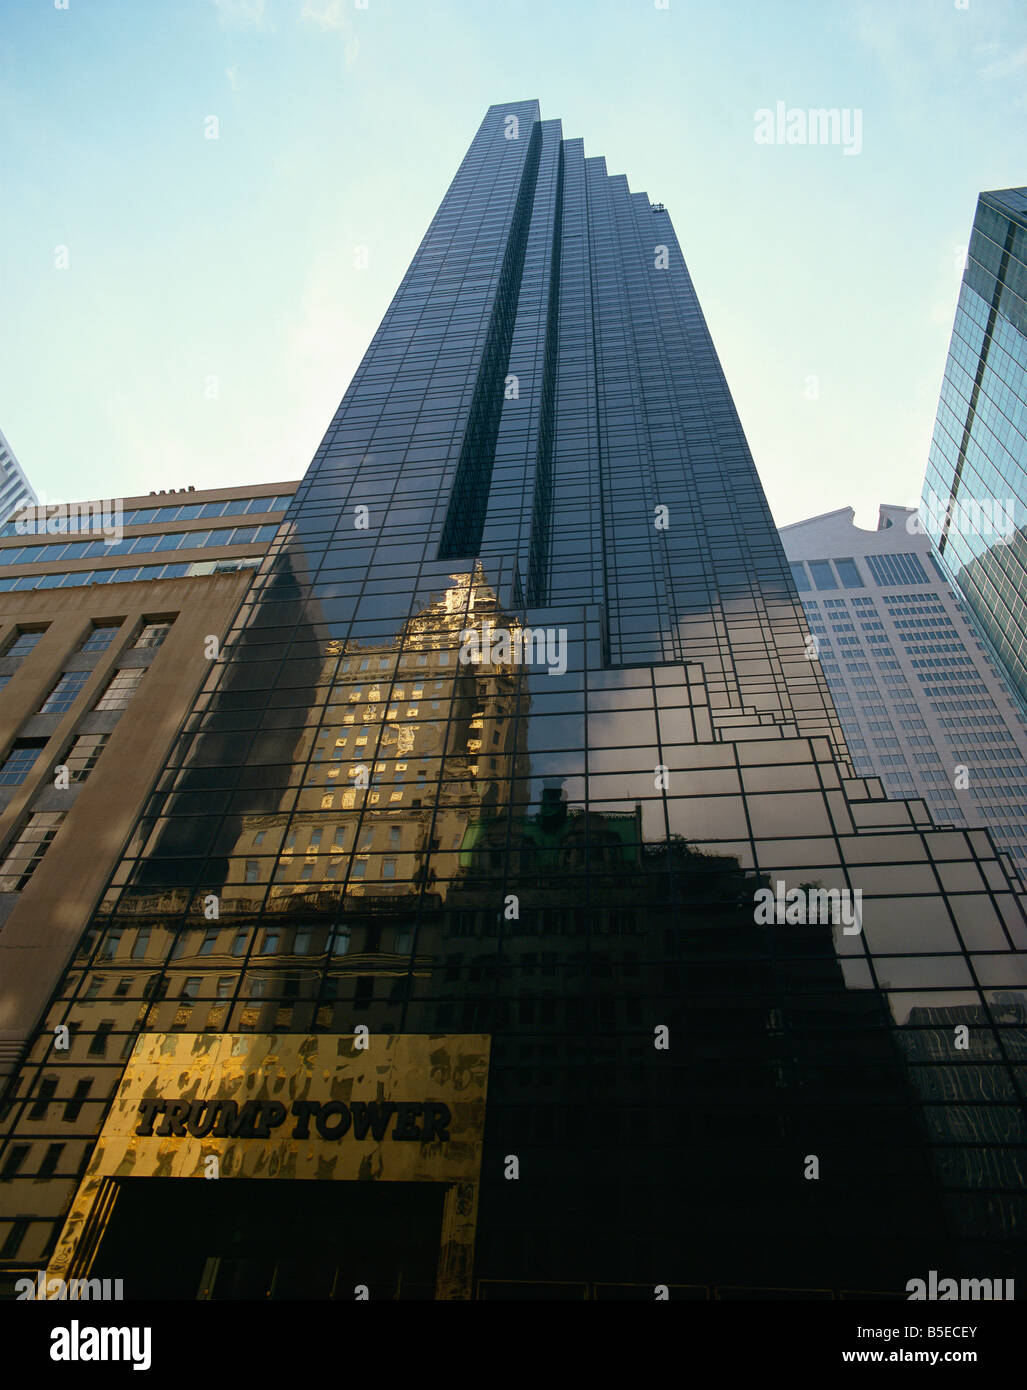 Trump Tower New York City New York United States Of